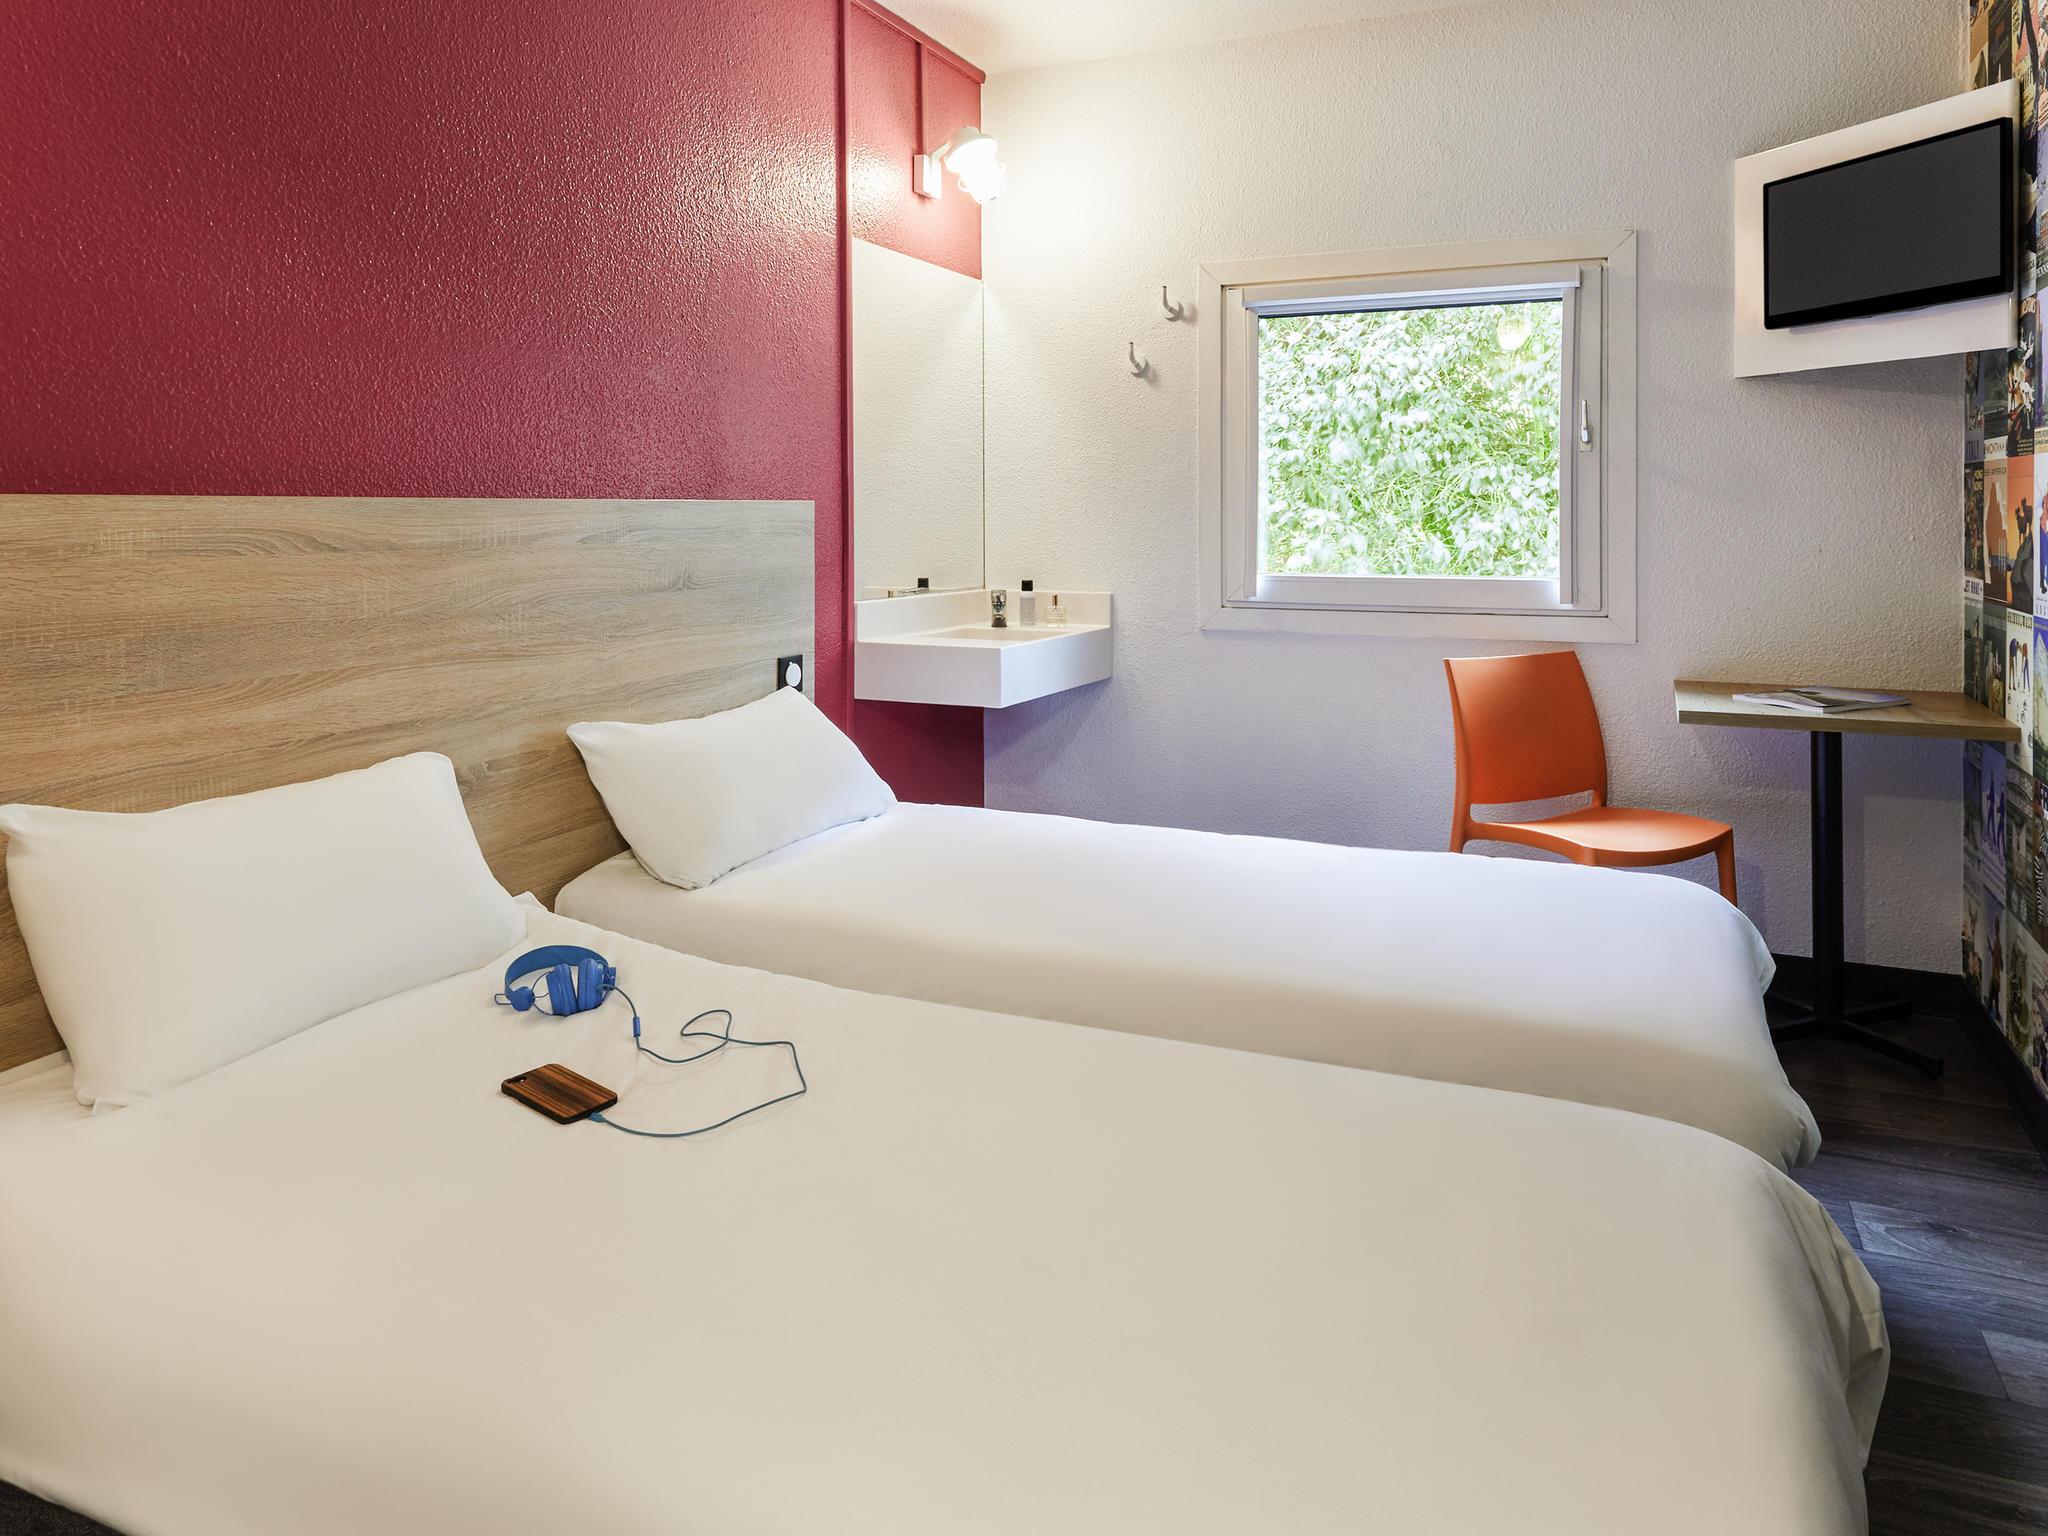 Hotell – hotelF1 Rungis Orly (rénové)